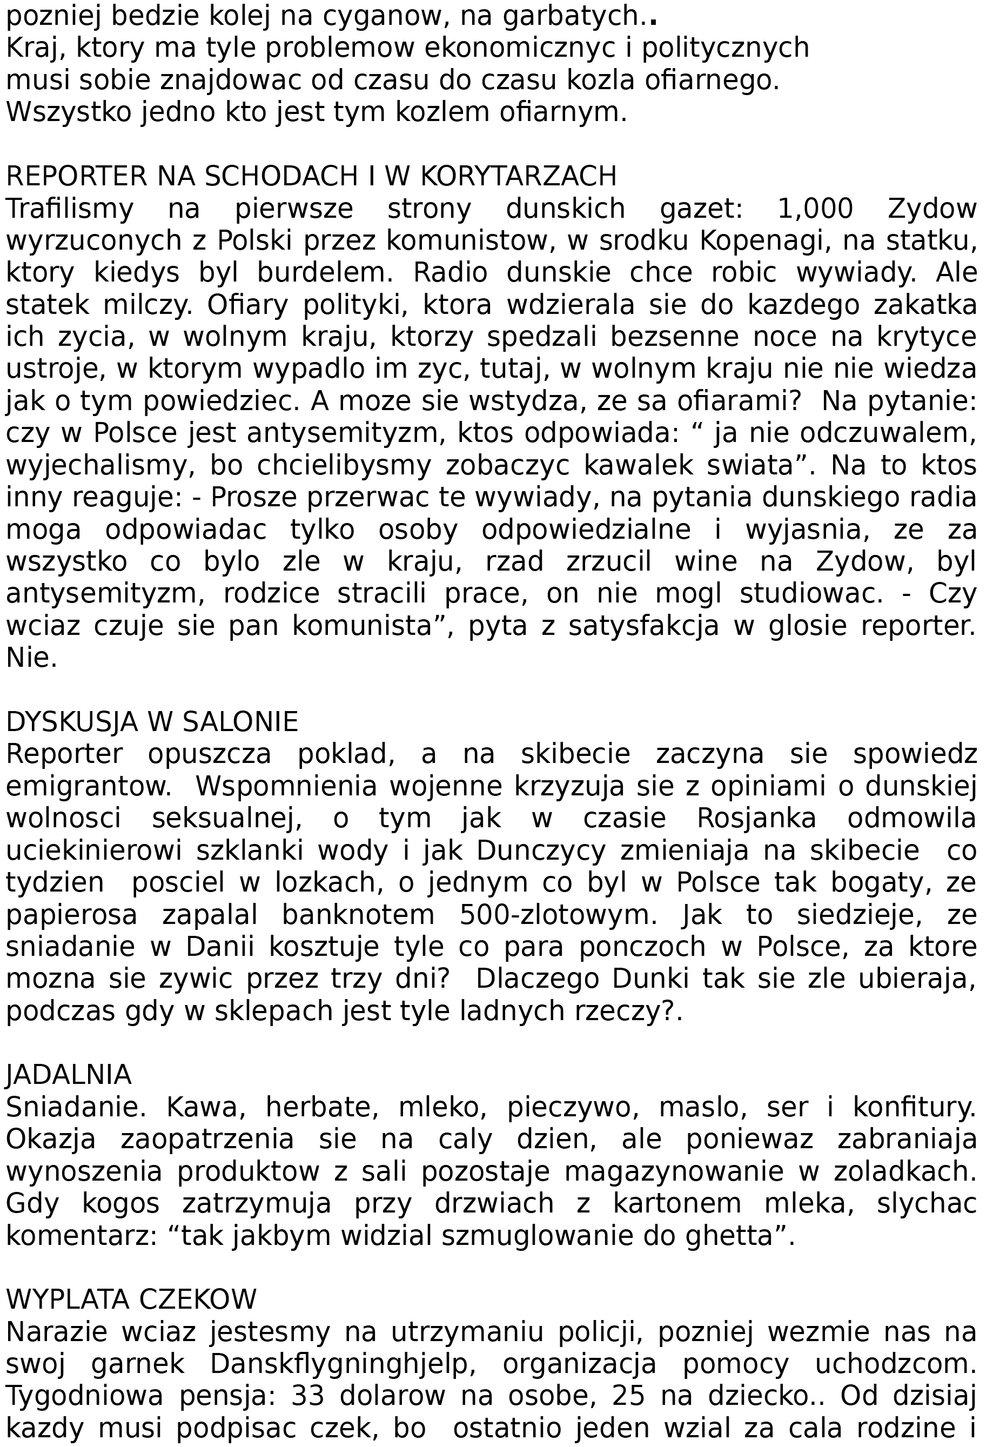 SKIBET-WERSJA-POLSKA-5.jpg